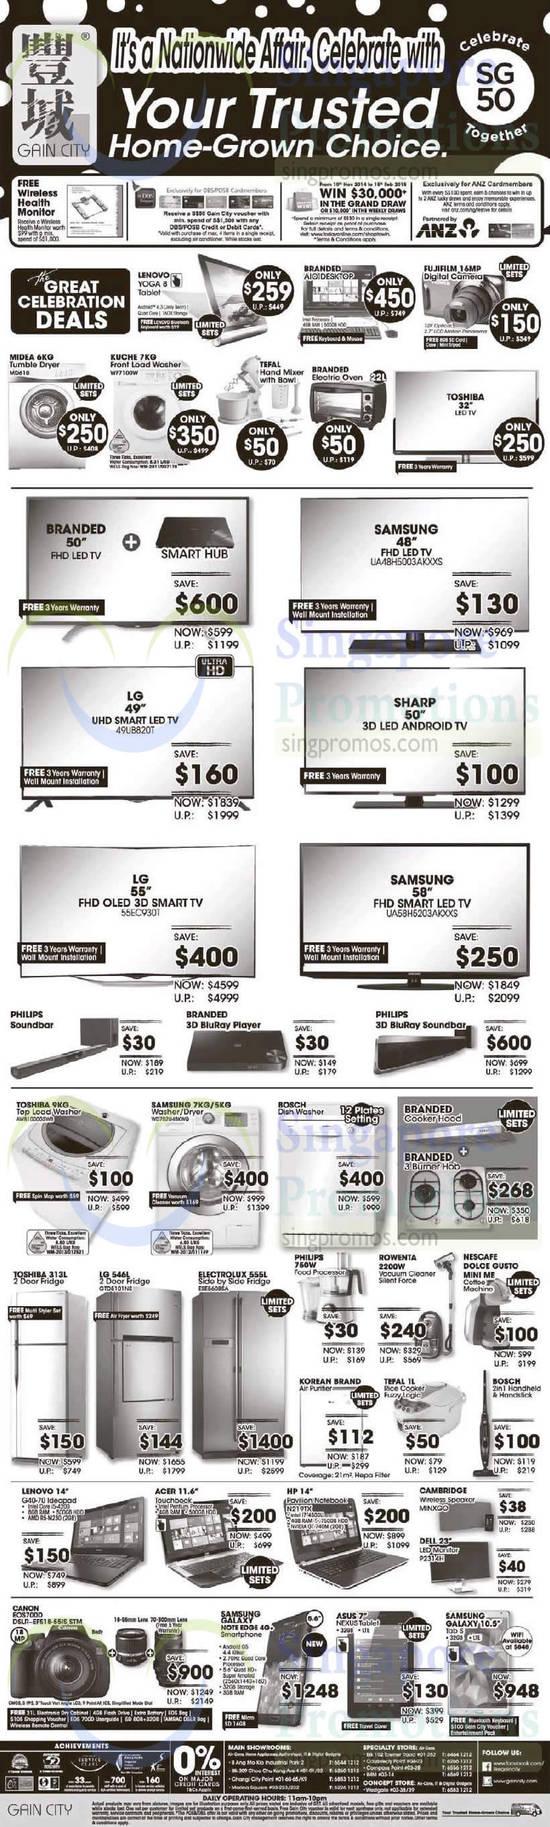 Lenovo Yoga 8 Tablet, Midea MD610 Dryer, Kuche WF7100W Washer, Samsung UA48H5003AKXXS TV, LG 49UB820T TV, LG 55EC9301 TV, Samsung UA58H5203AKXXS TV, Toshiba AWB1000G5WB Washer, LG GTD5101NS Fridge, Lenovo G40-70 Notebook, HP N219TX Notebook, Samsung Galaxy Tab S 10.5, Samsung Galaxy Note Edge, Canon EOS 700D DSLR Digital Camera